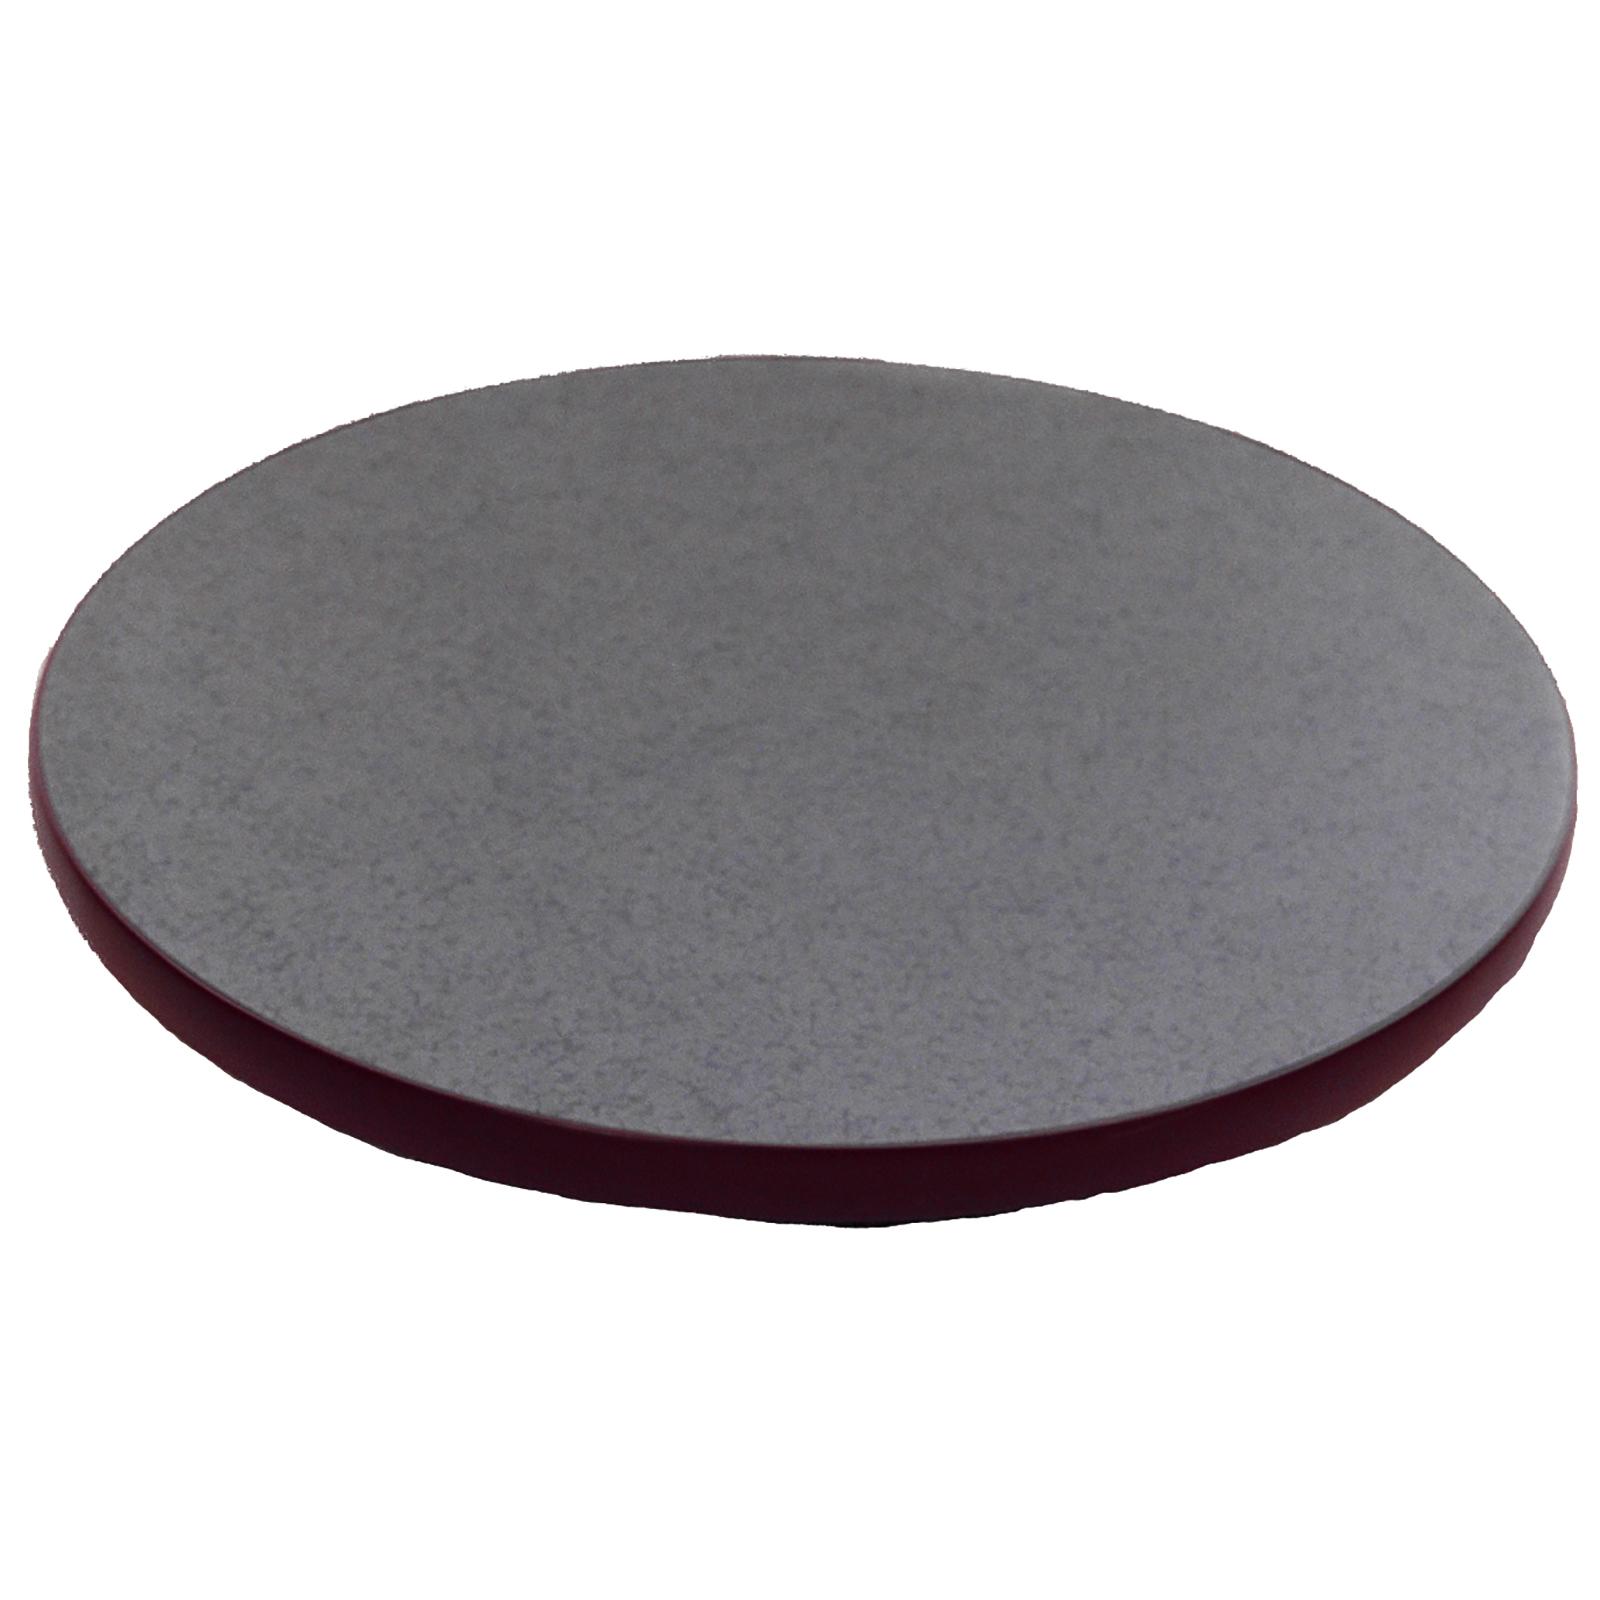 Oak Street CTM2442-1 table top, laminate